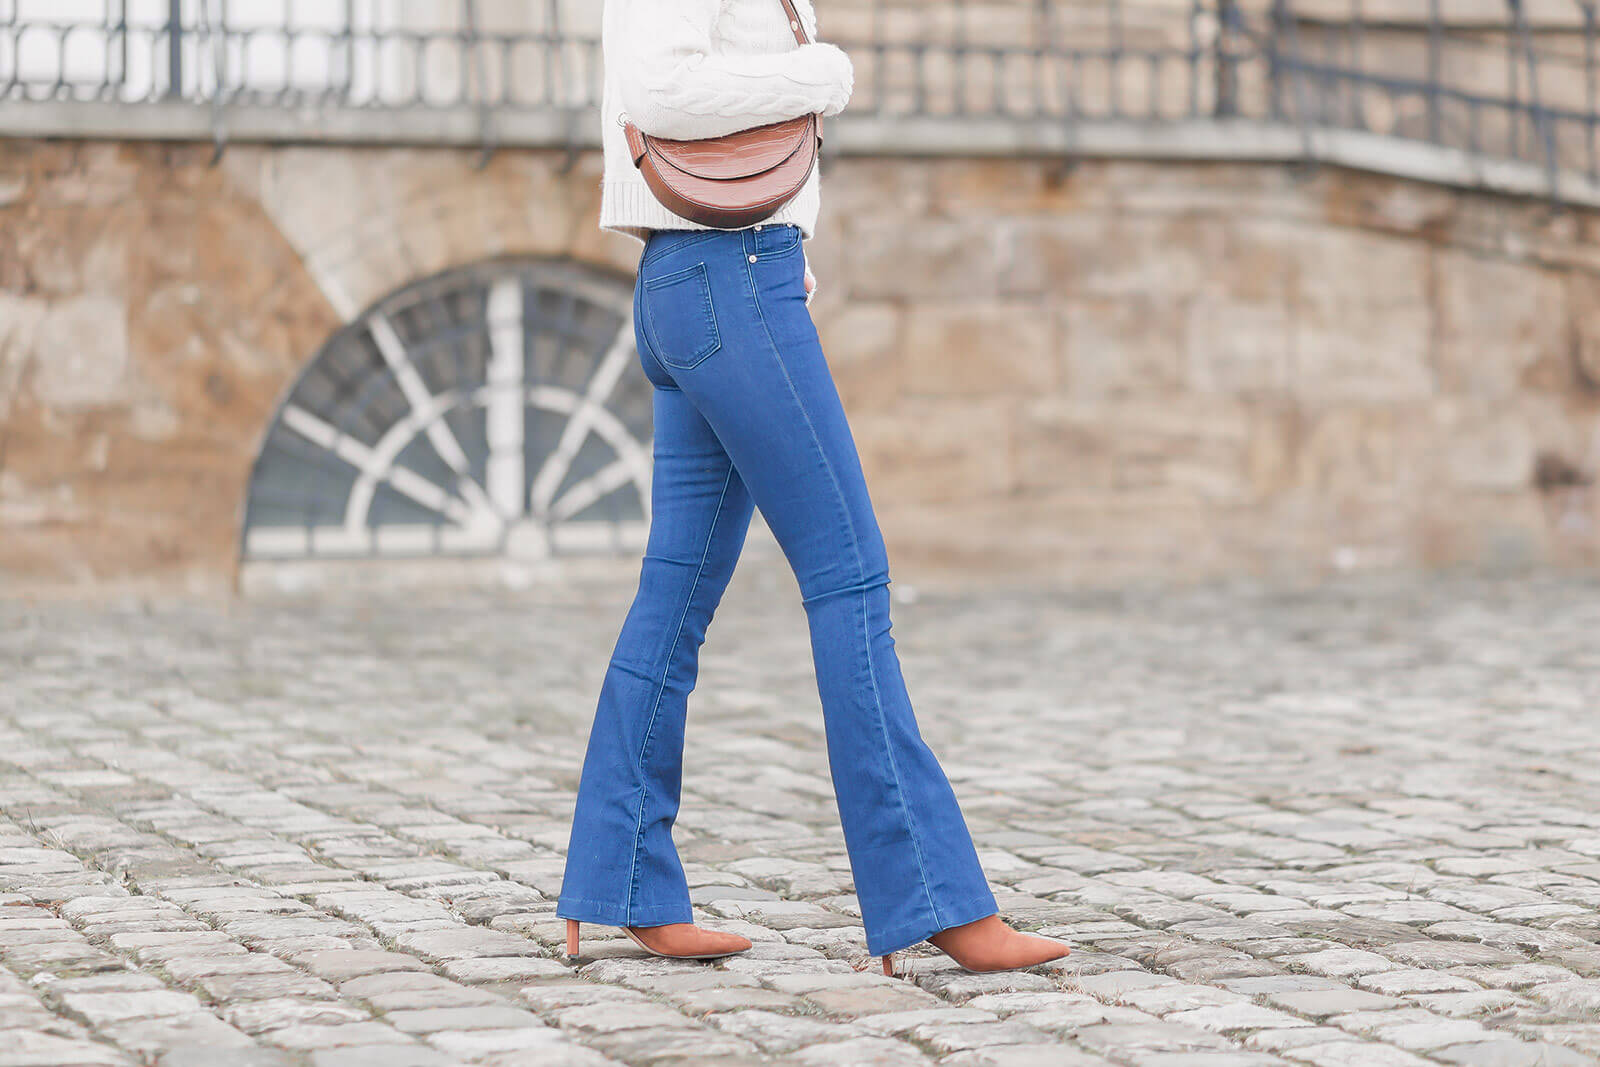 Jeans Trends 2021 - Bootcut Jeans kombinieren